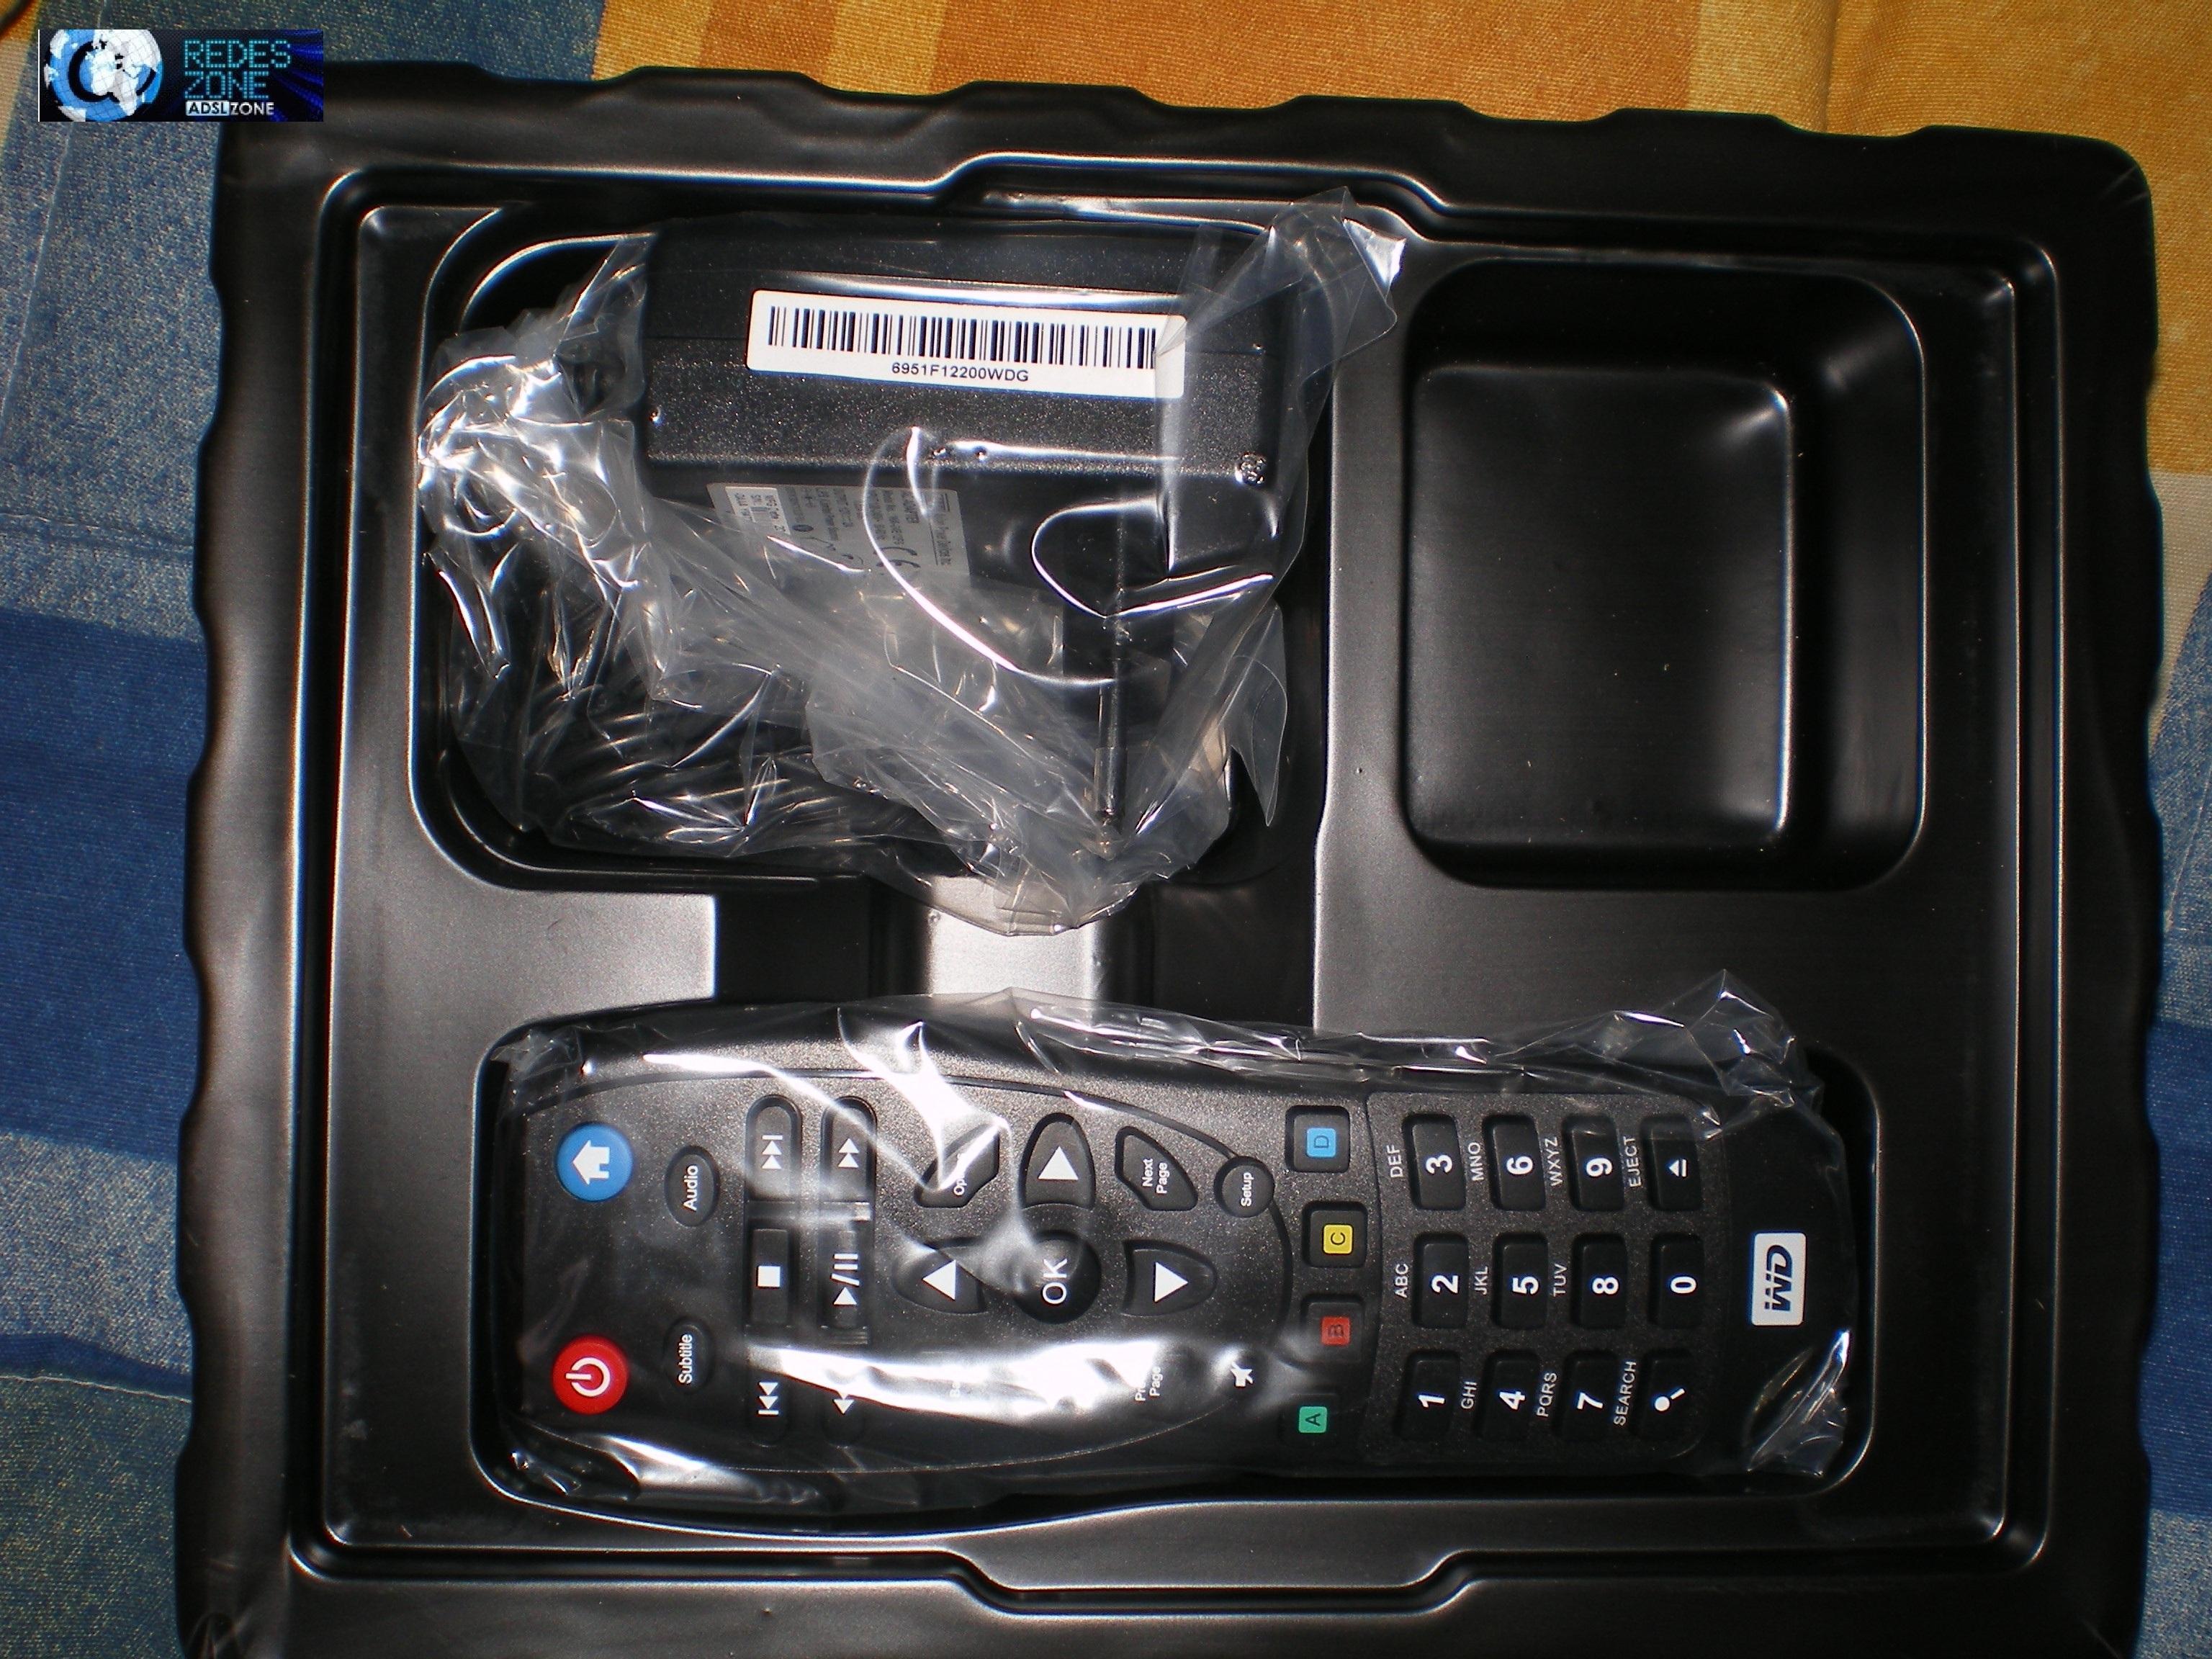 western digital wd tv live hub manual